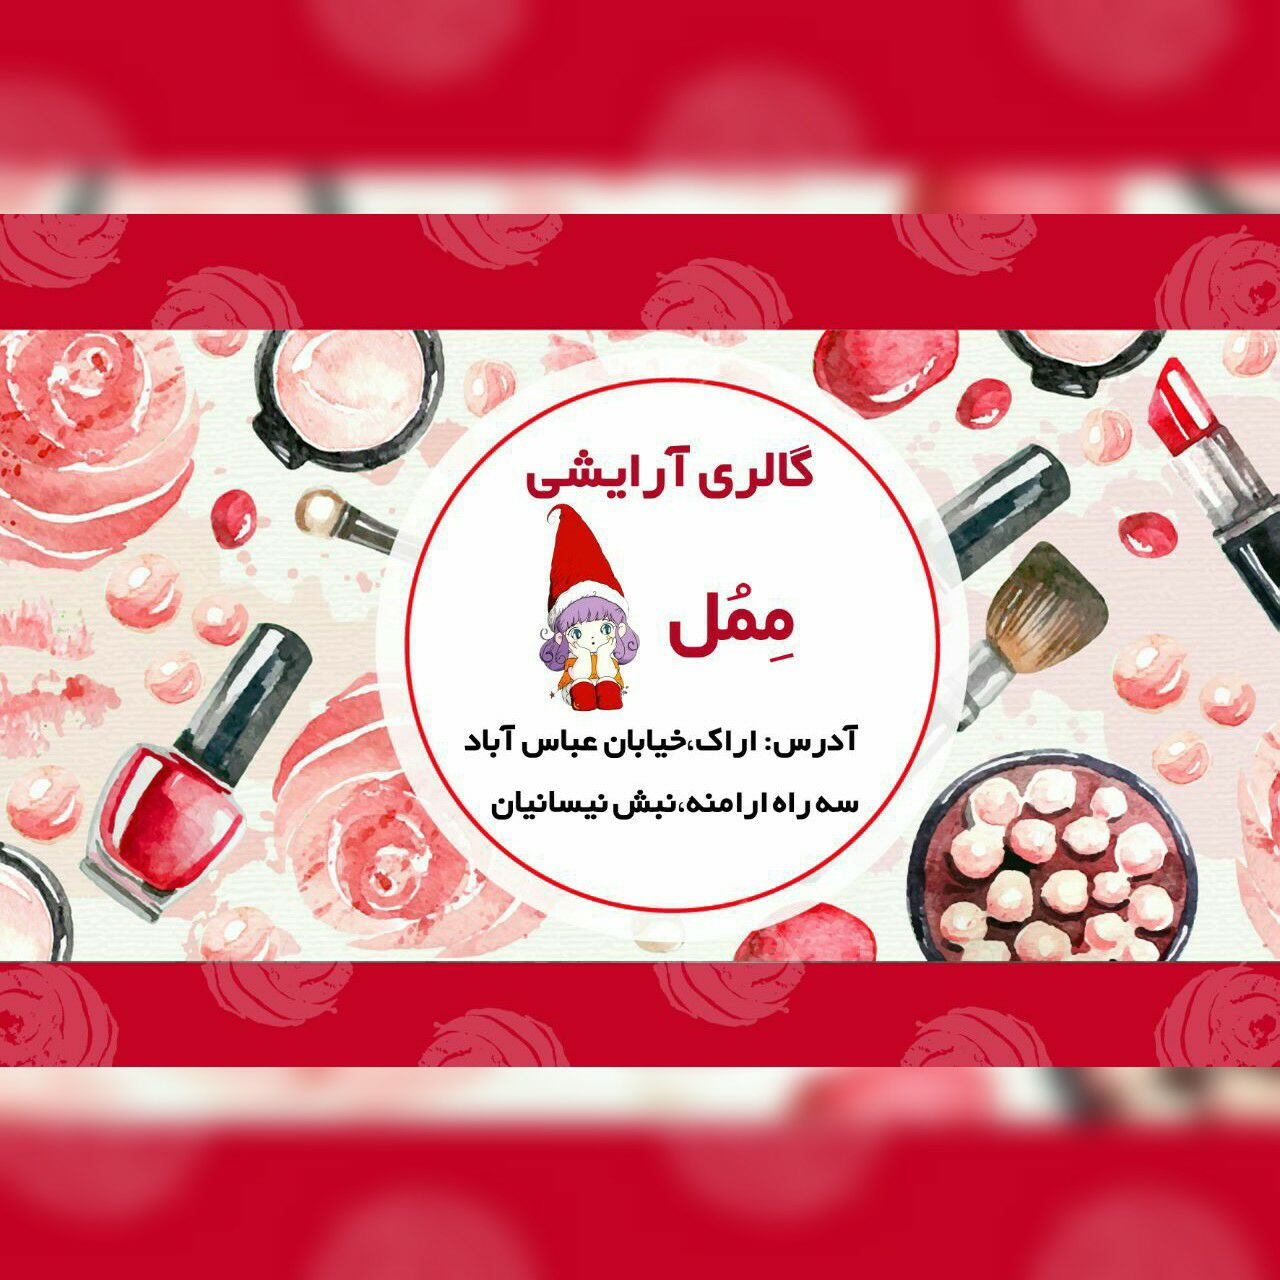 کانال تلگرام آرایشی بهداشتی ممل | Memol Makeup